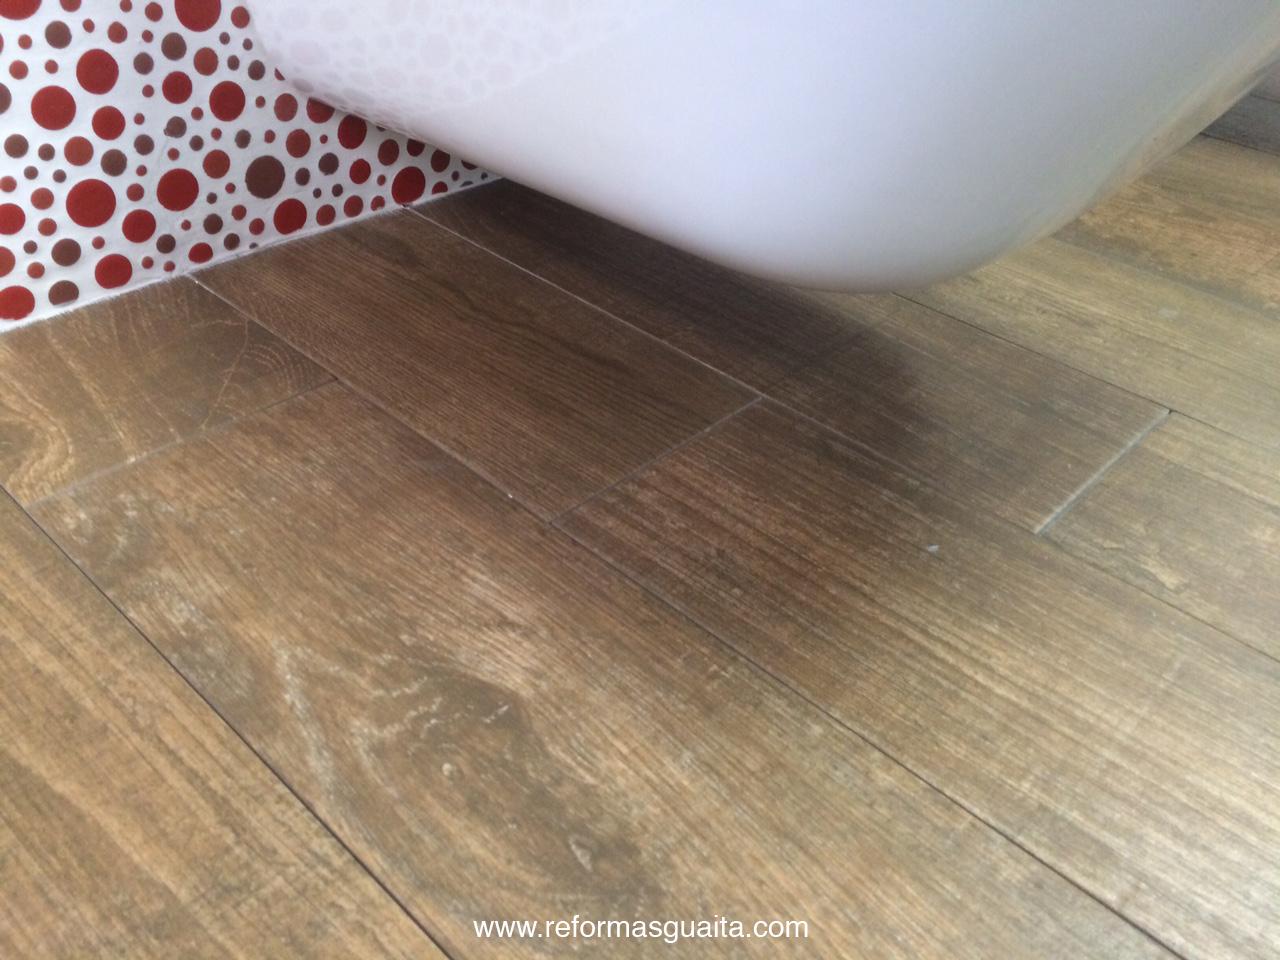 Ceramica imitacion parquet plank simil madera x ra scop ceramica baldosas azulejos imitan - Suelos imitacion parquet ...